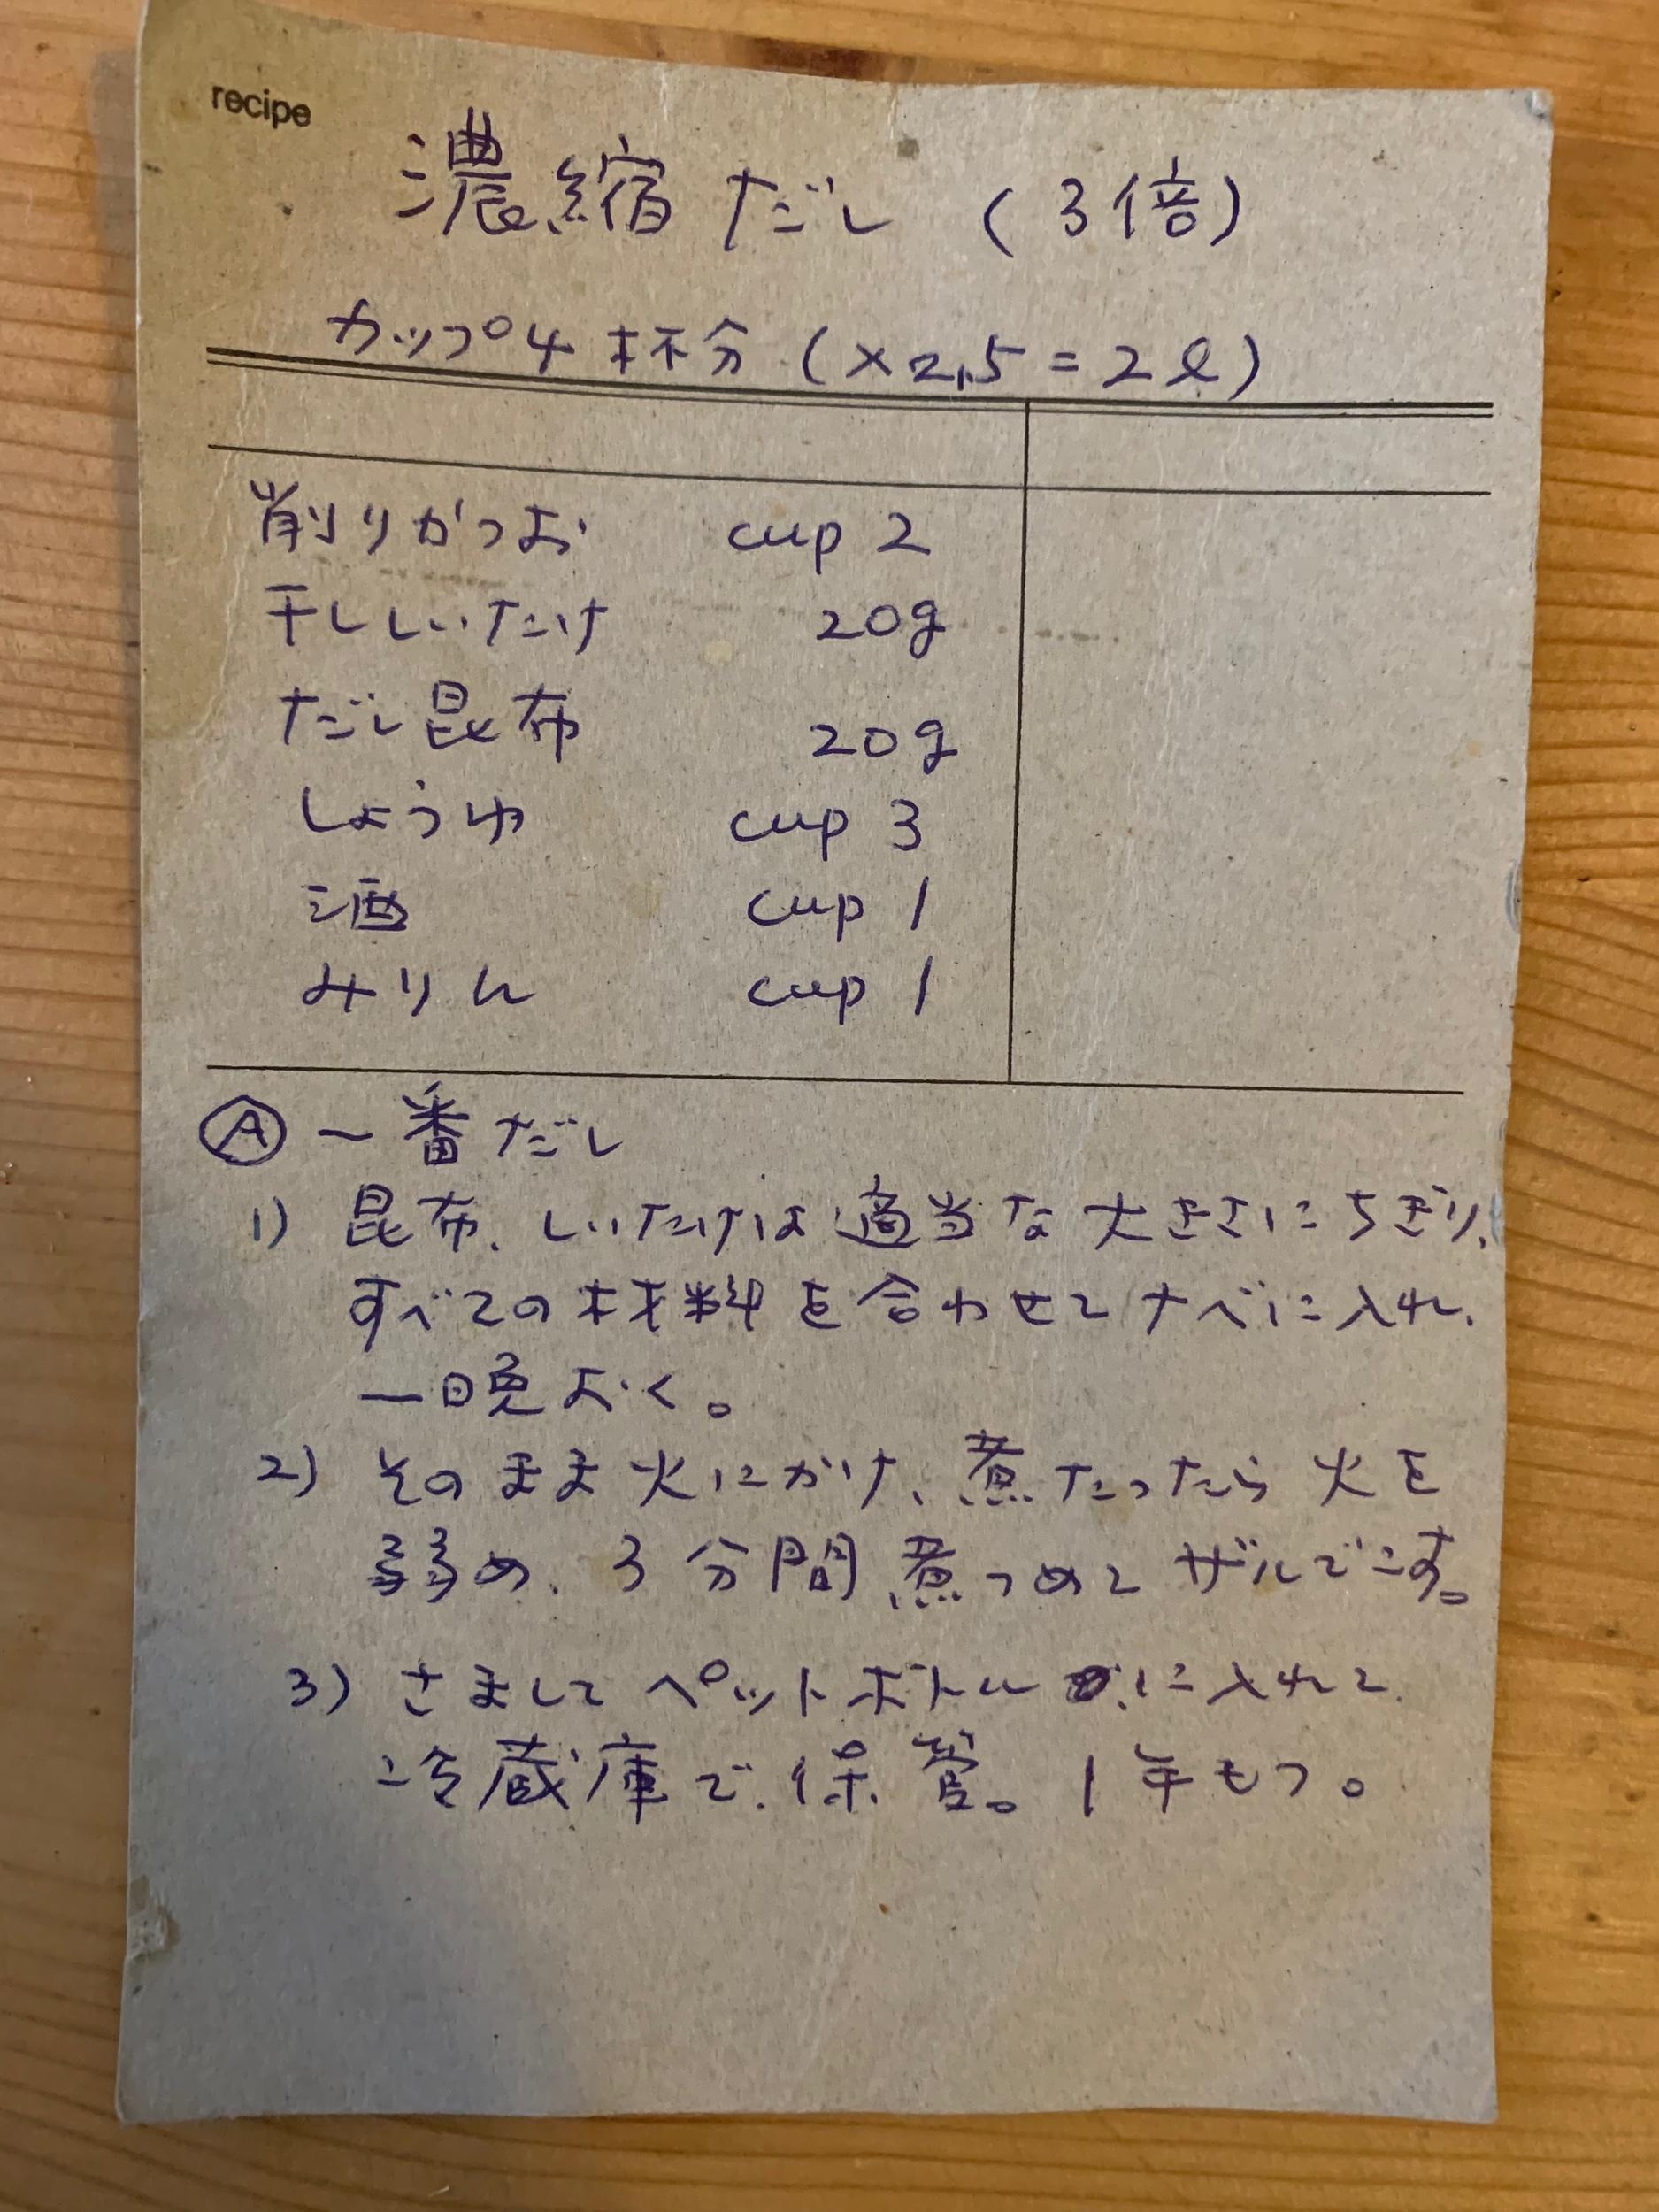 Keiko recipe, noodle soup base, ichibsn dashi, last a year in a fridge.